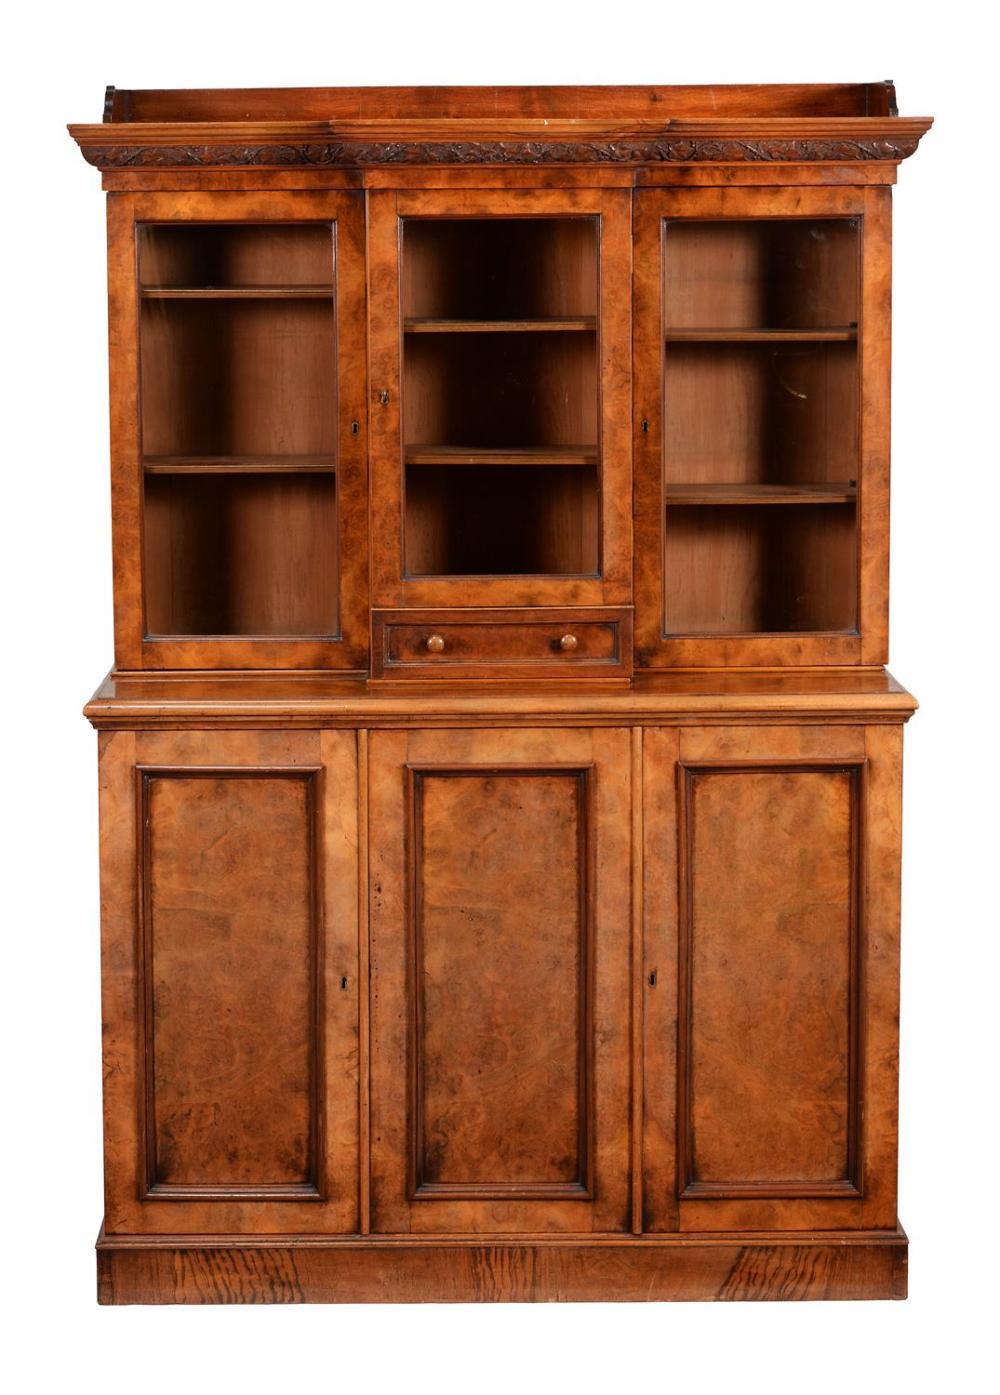 A Victorian walnut cabinet bookcase